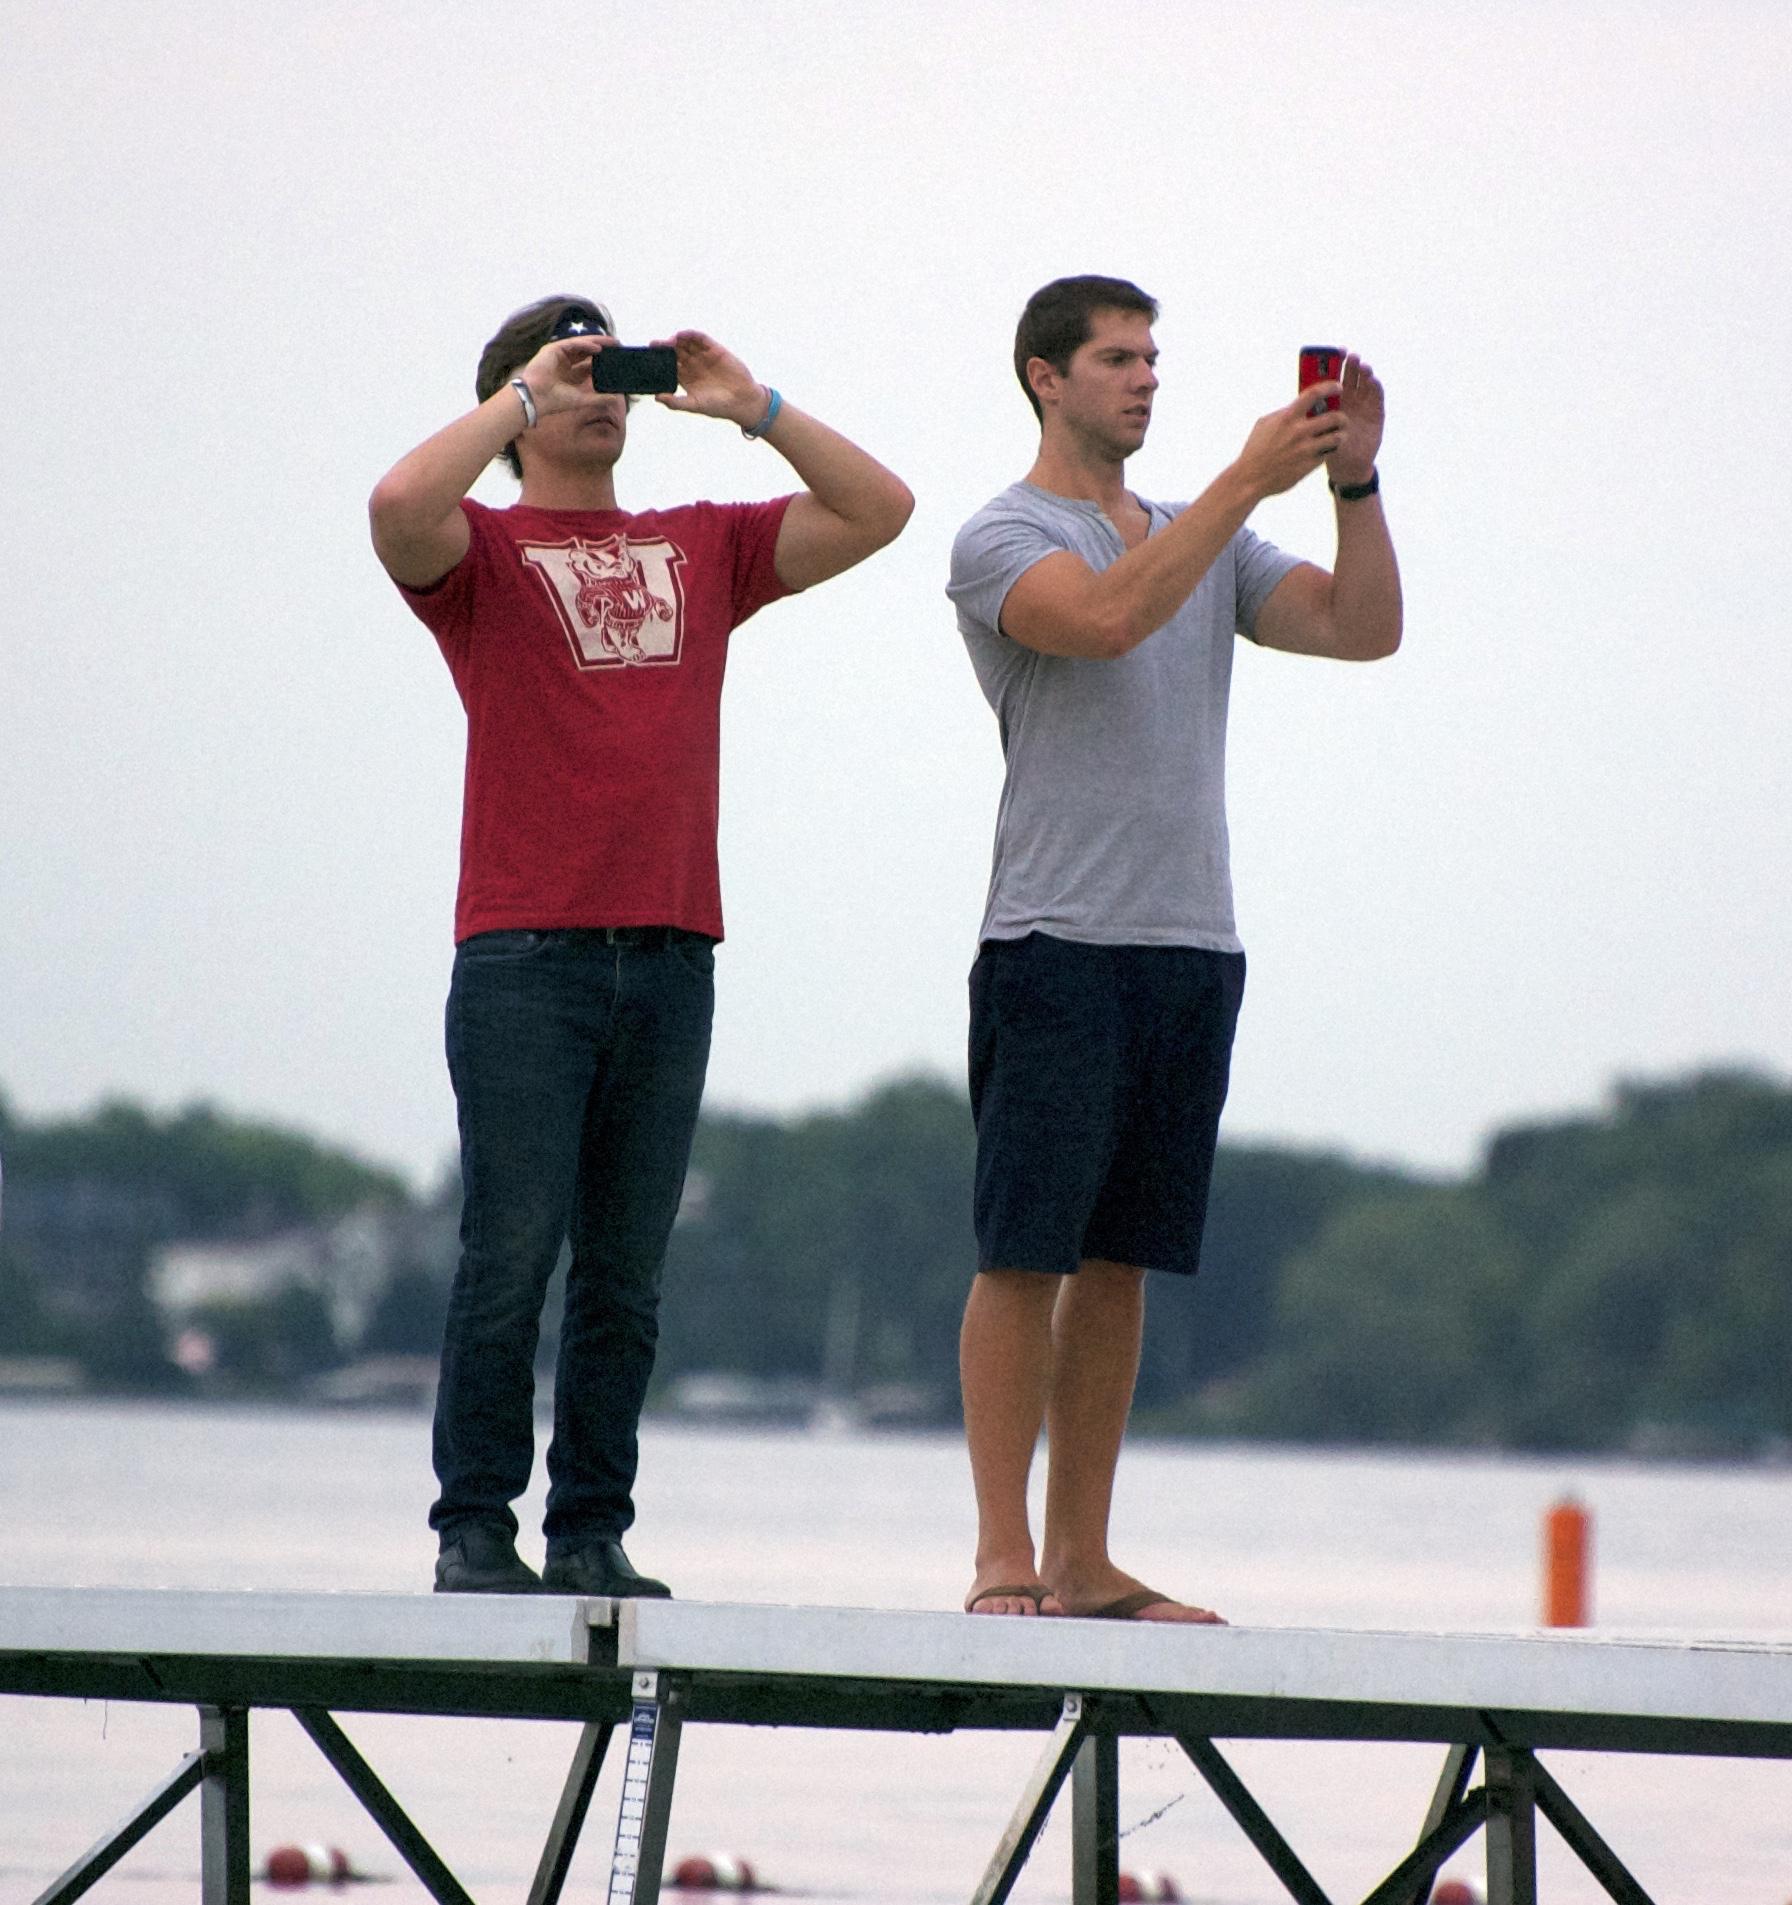 Camera Men. Memorial Union Terrace. Madison, Wisconsin. July 2014. © William D. Walker